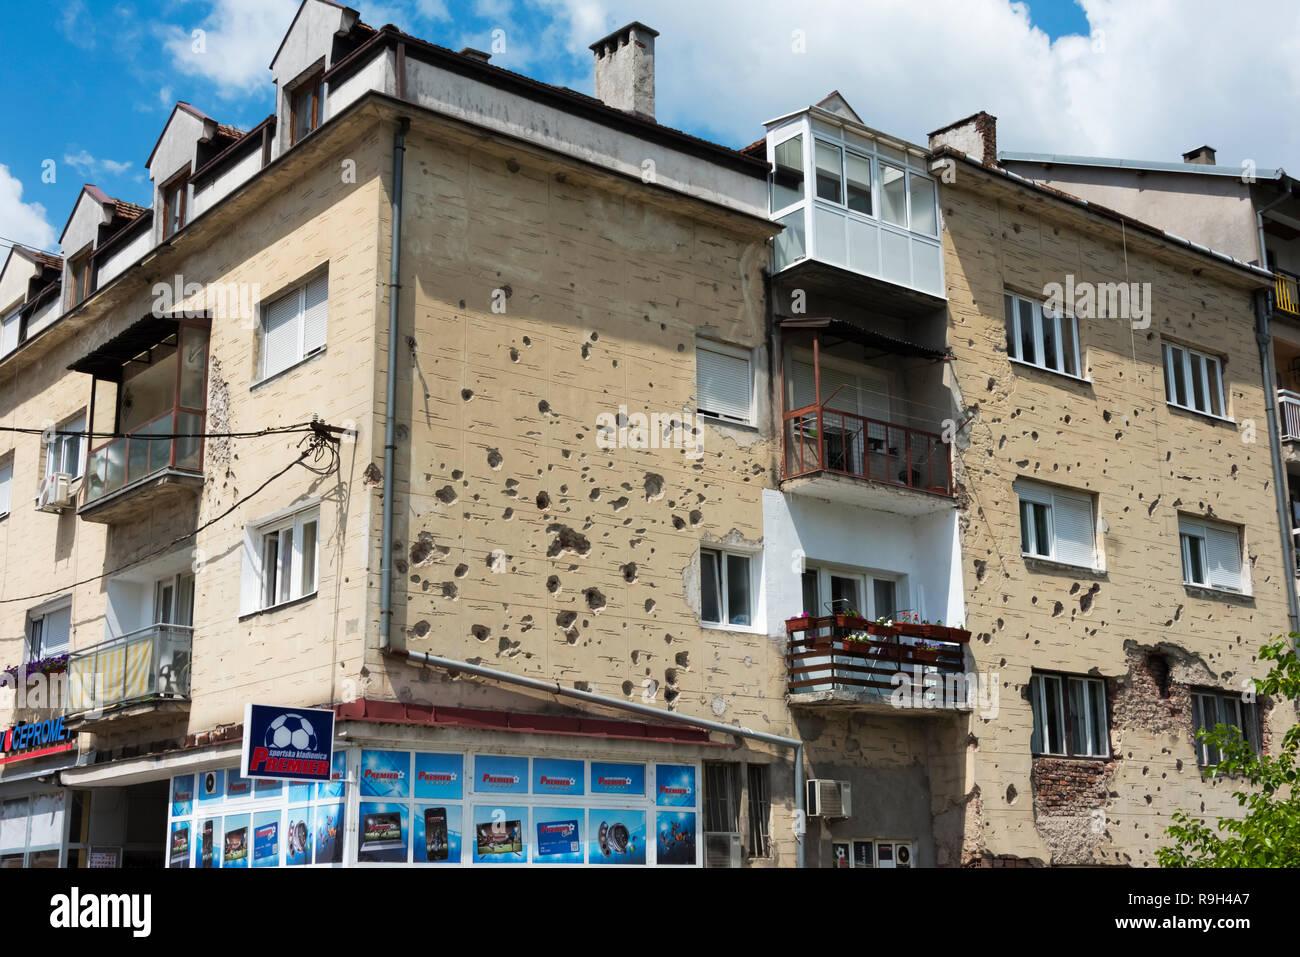 Bullet holes on wall, Konjic, Bosnia and Herzegovina - Stock Image